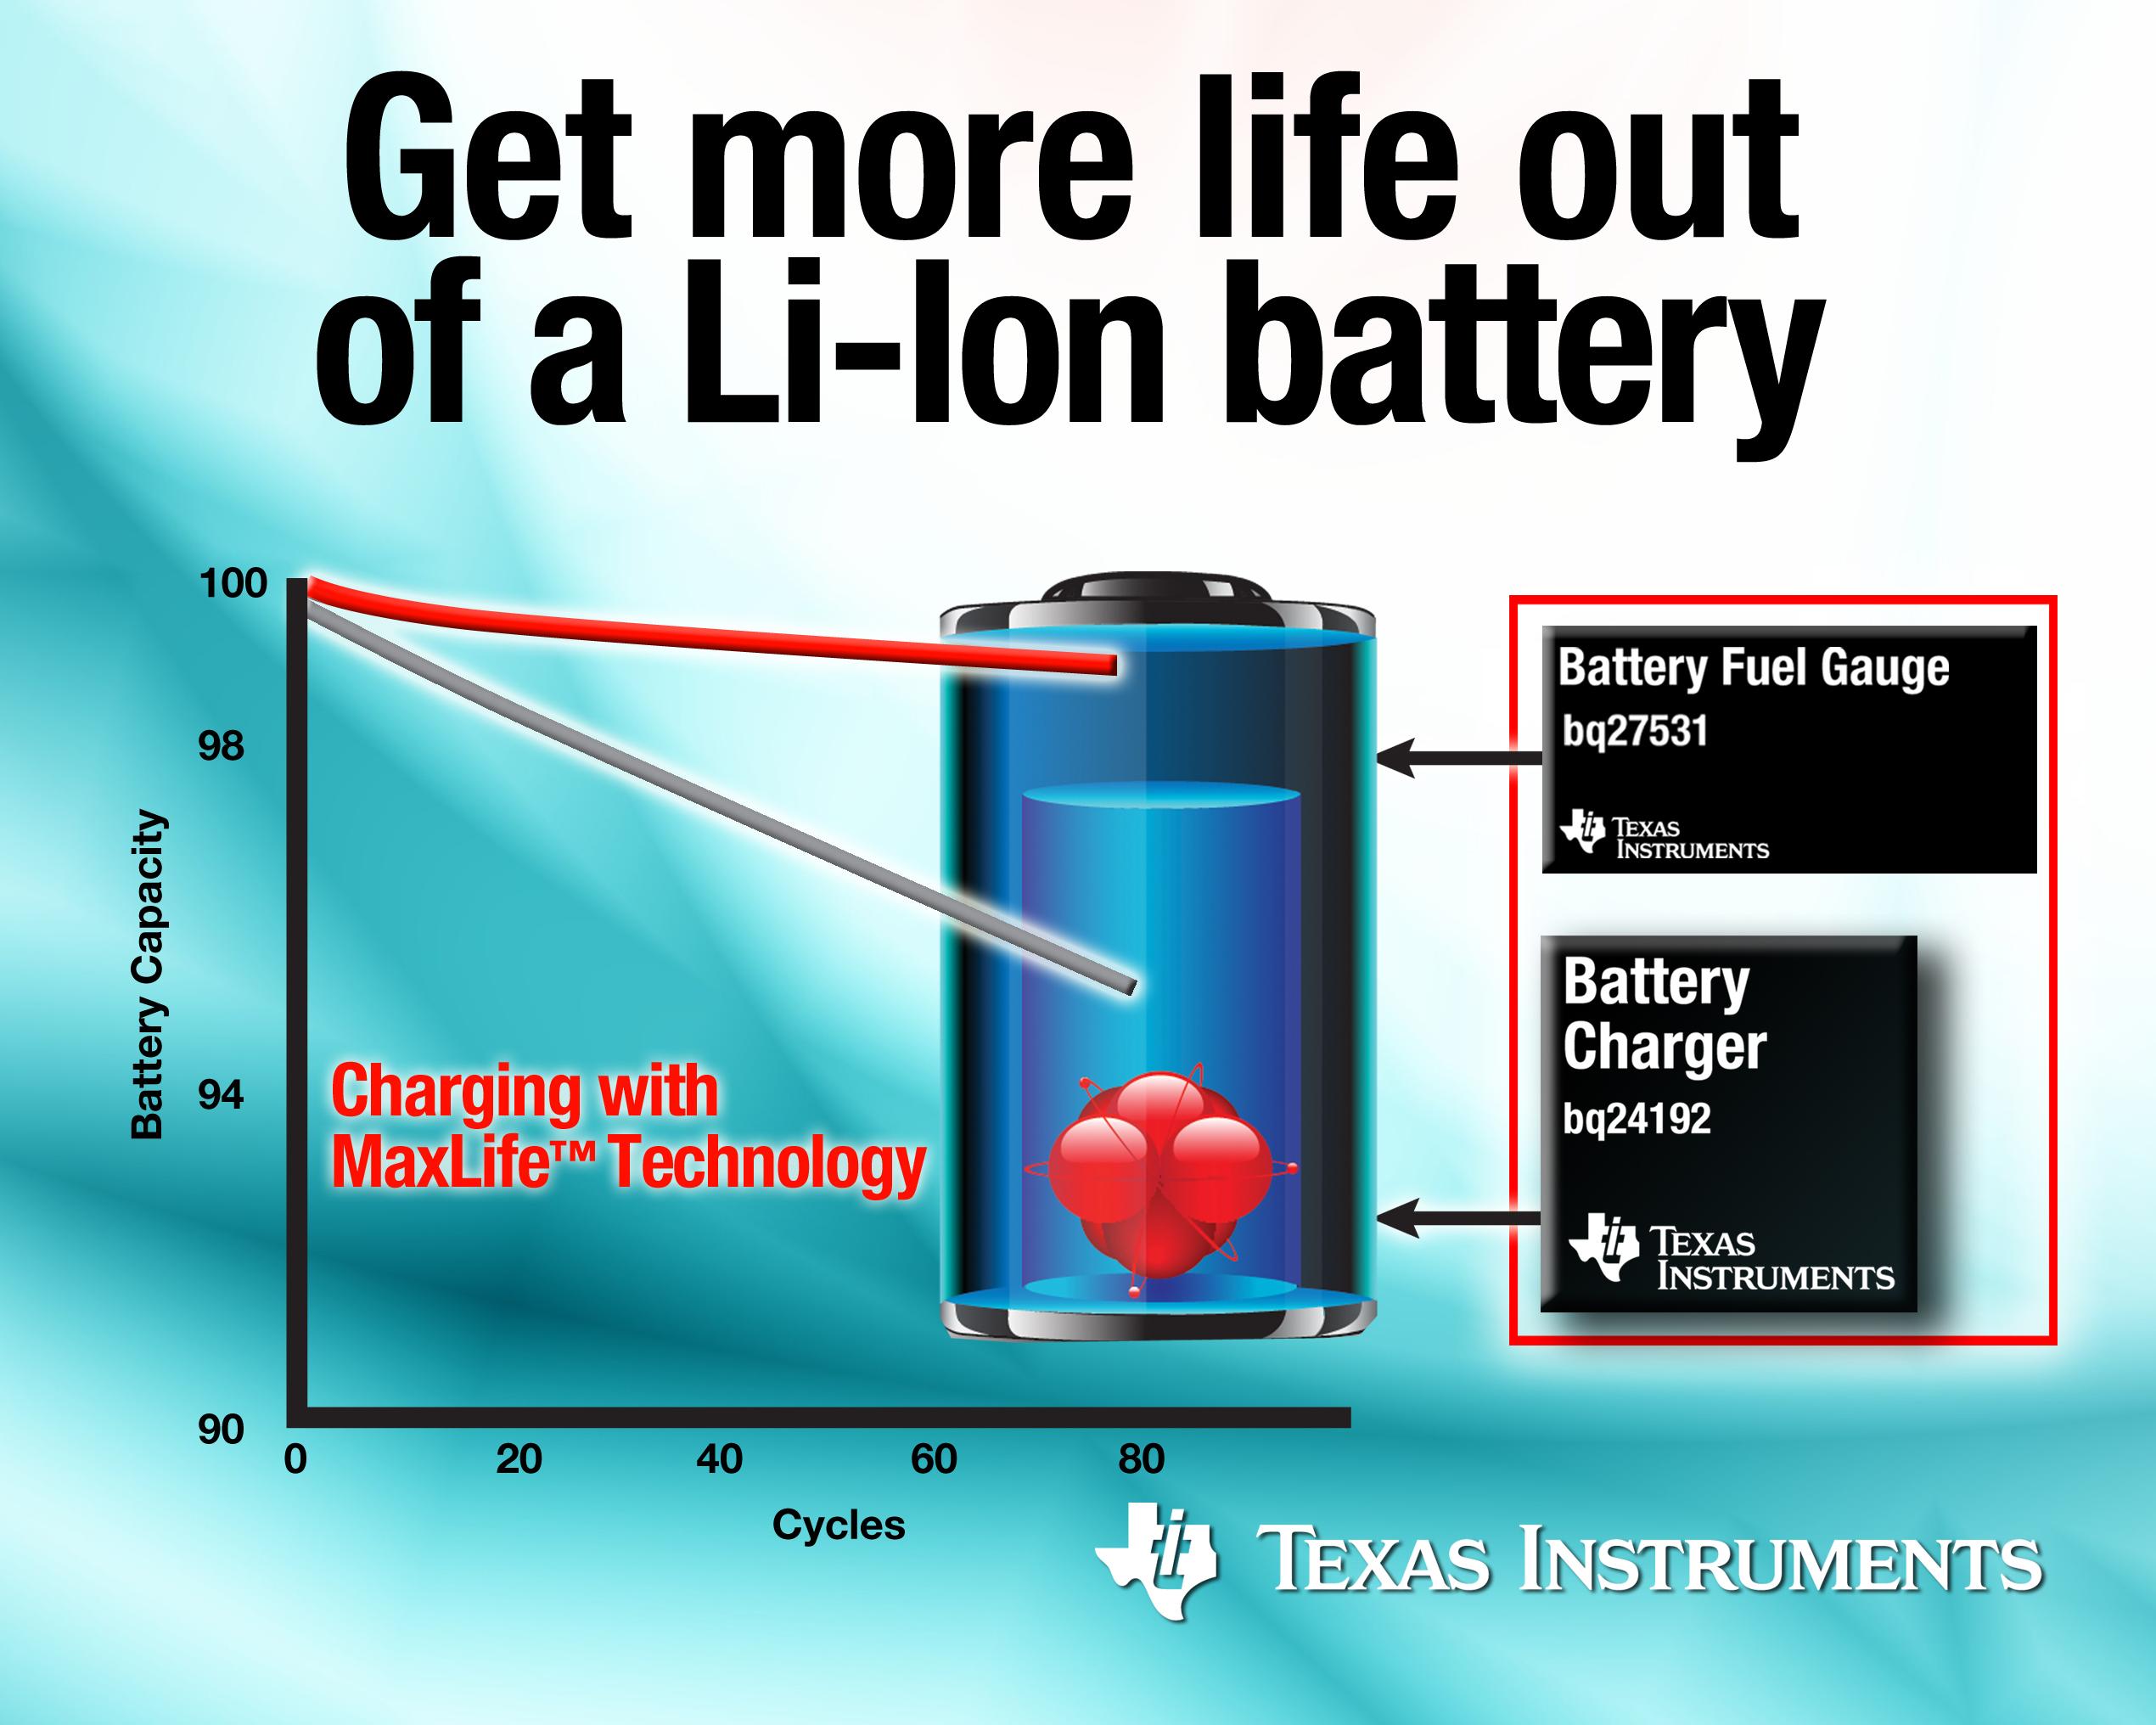 MaxLife battery